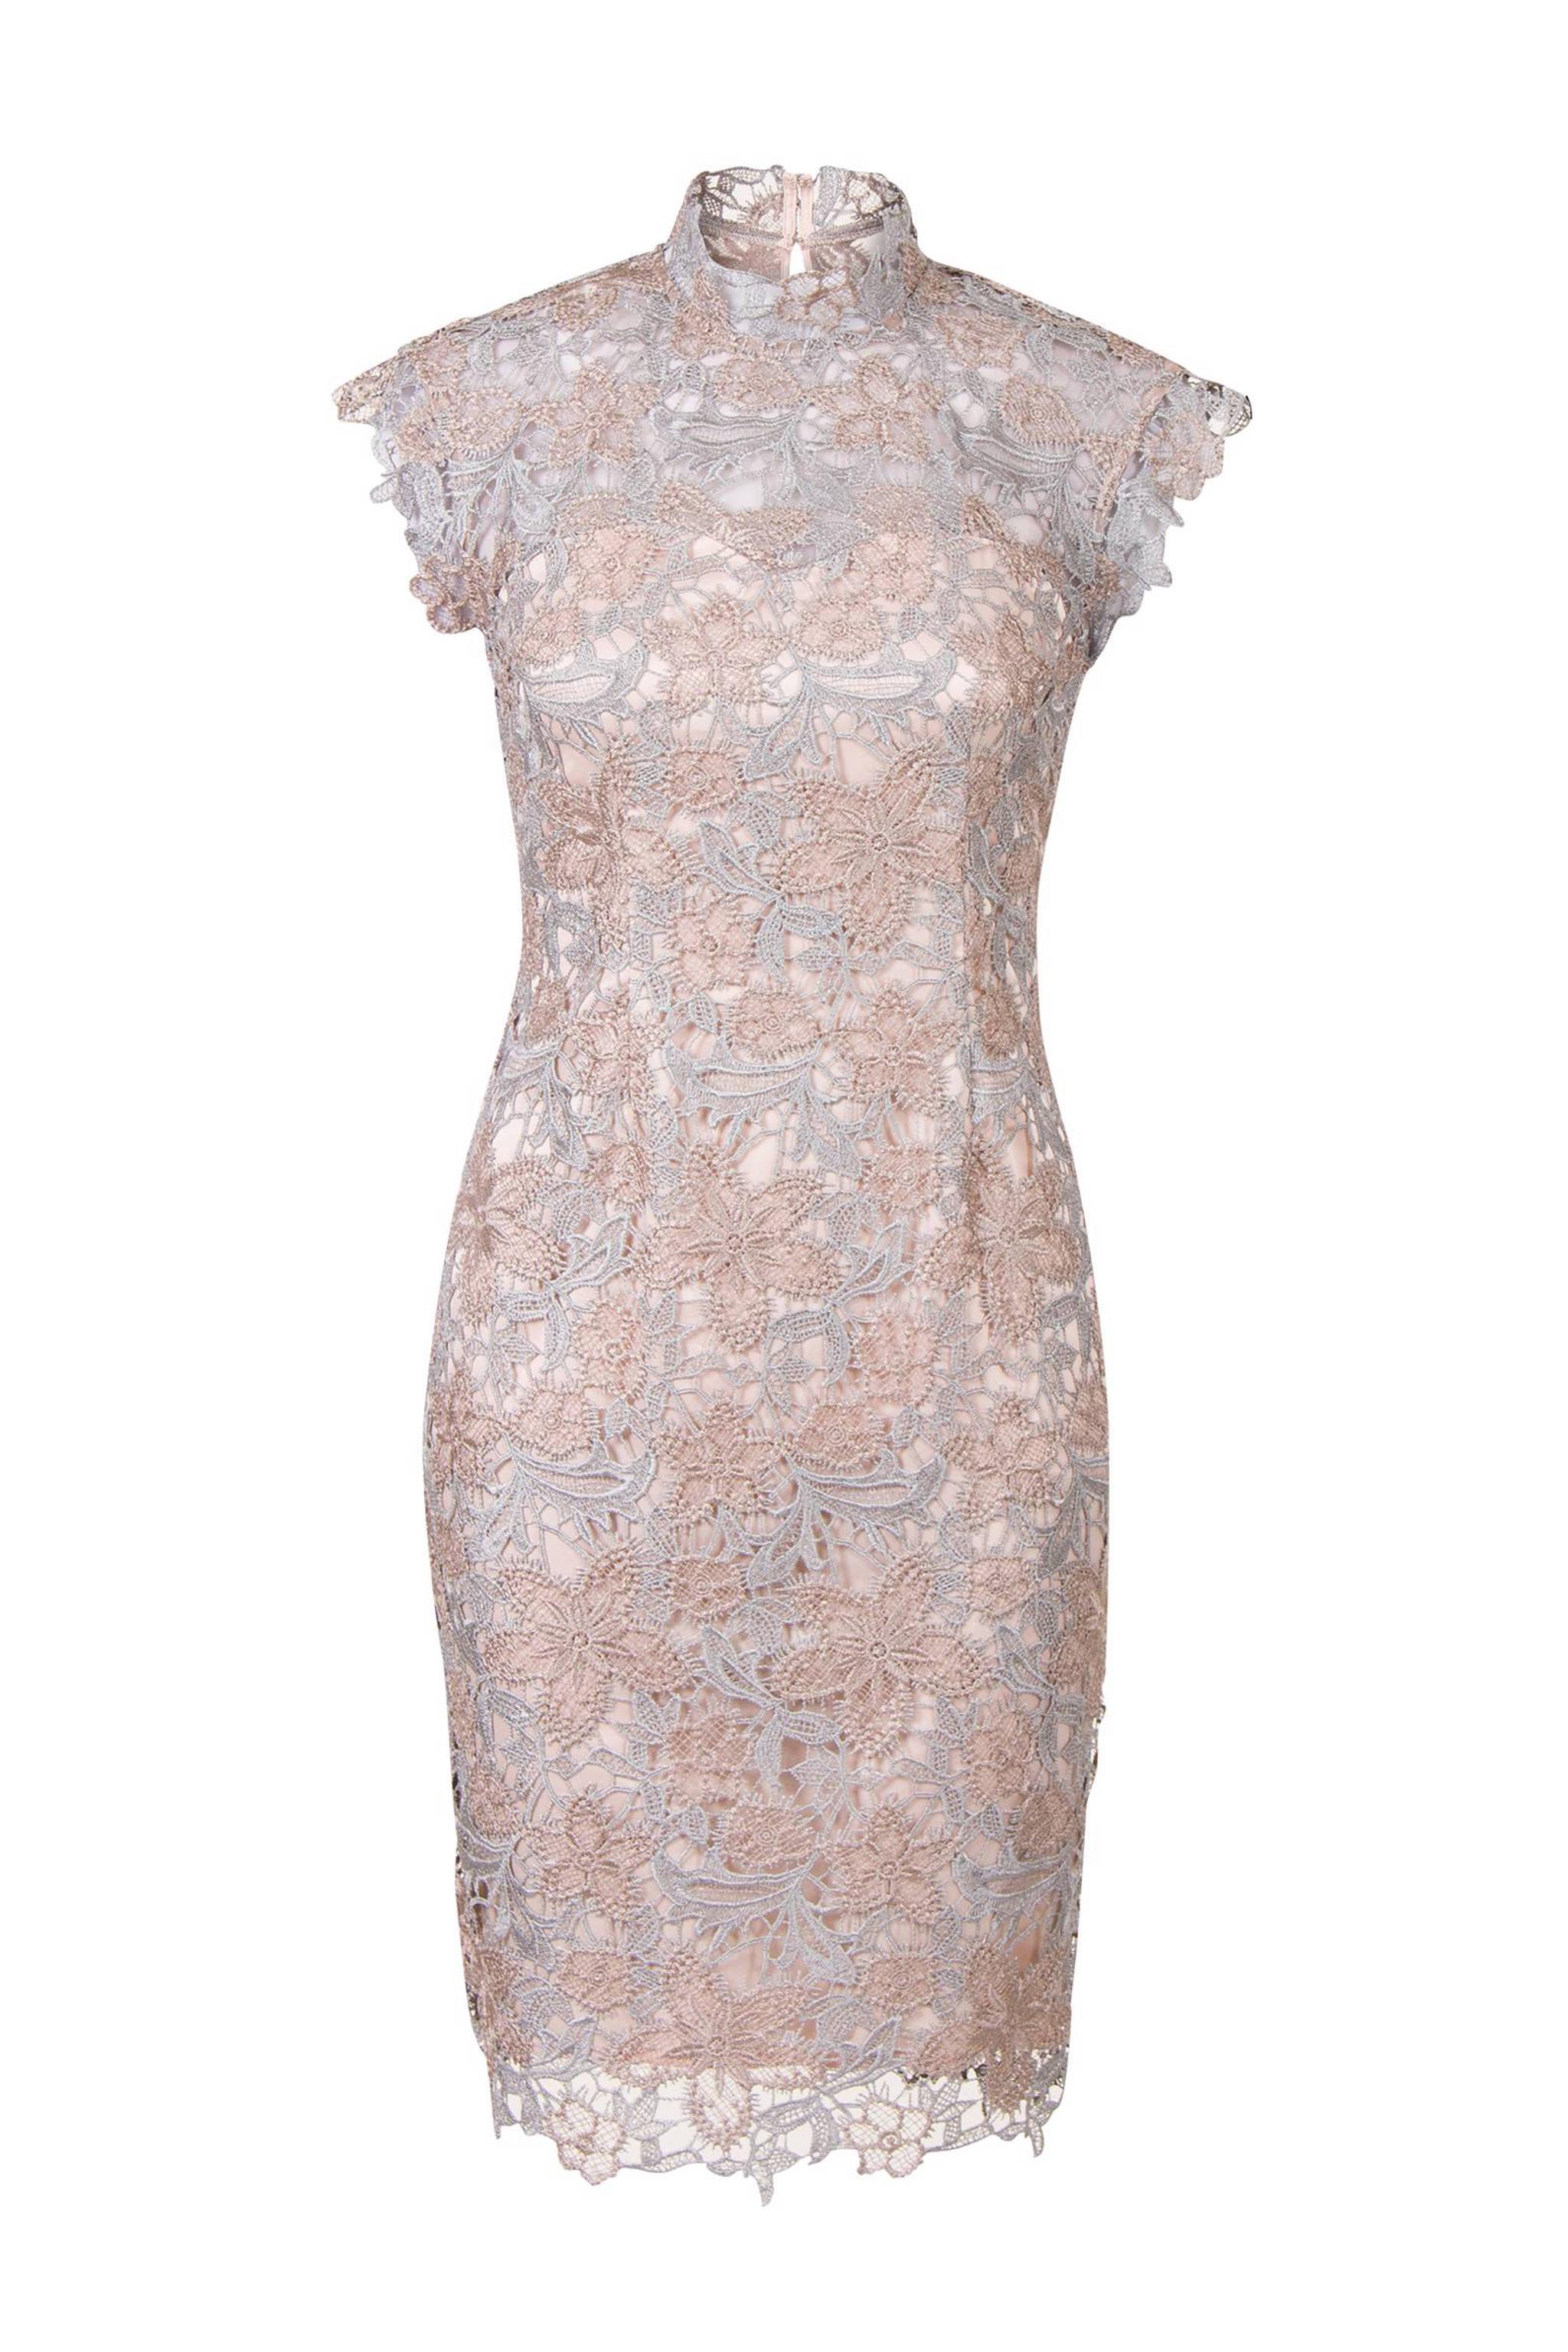 Ongekend Steps kanten jurk lichtroze | wehkamp KJ-04